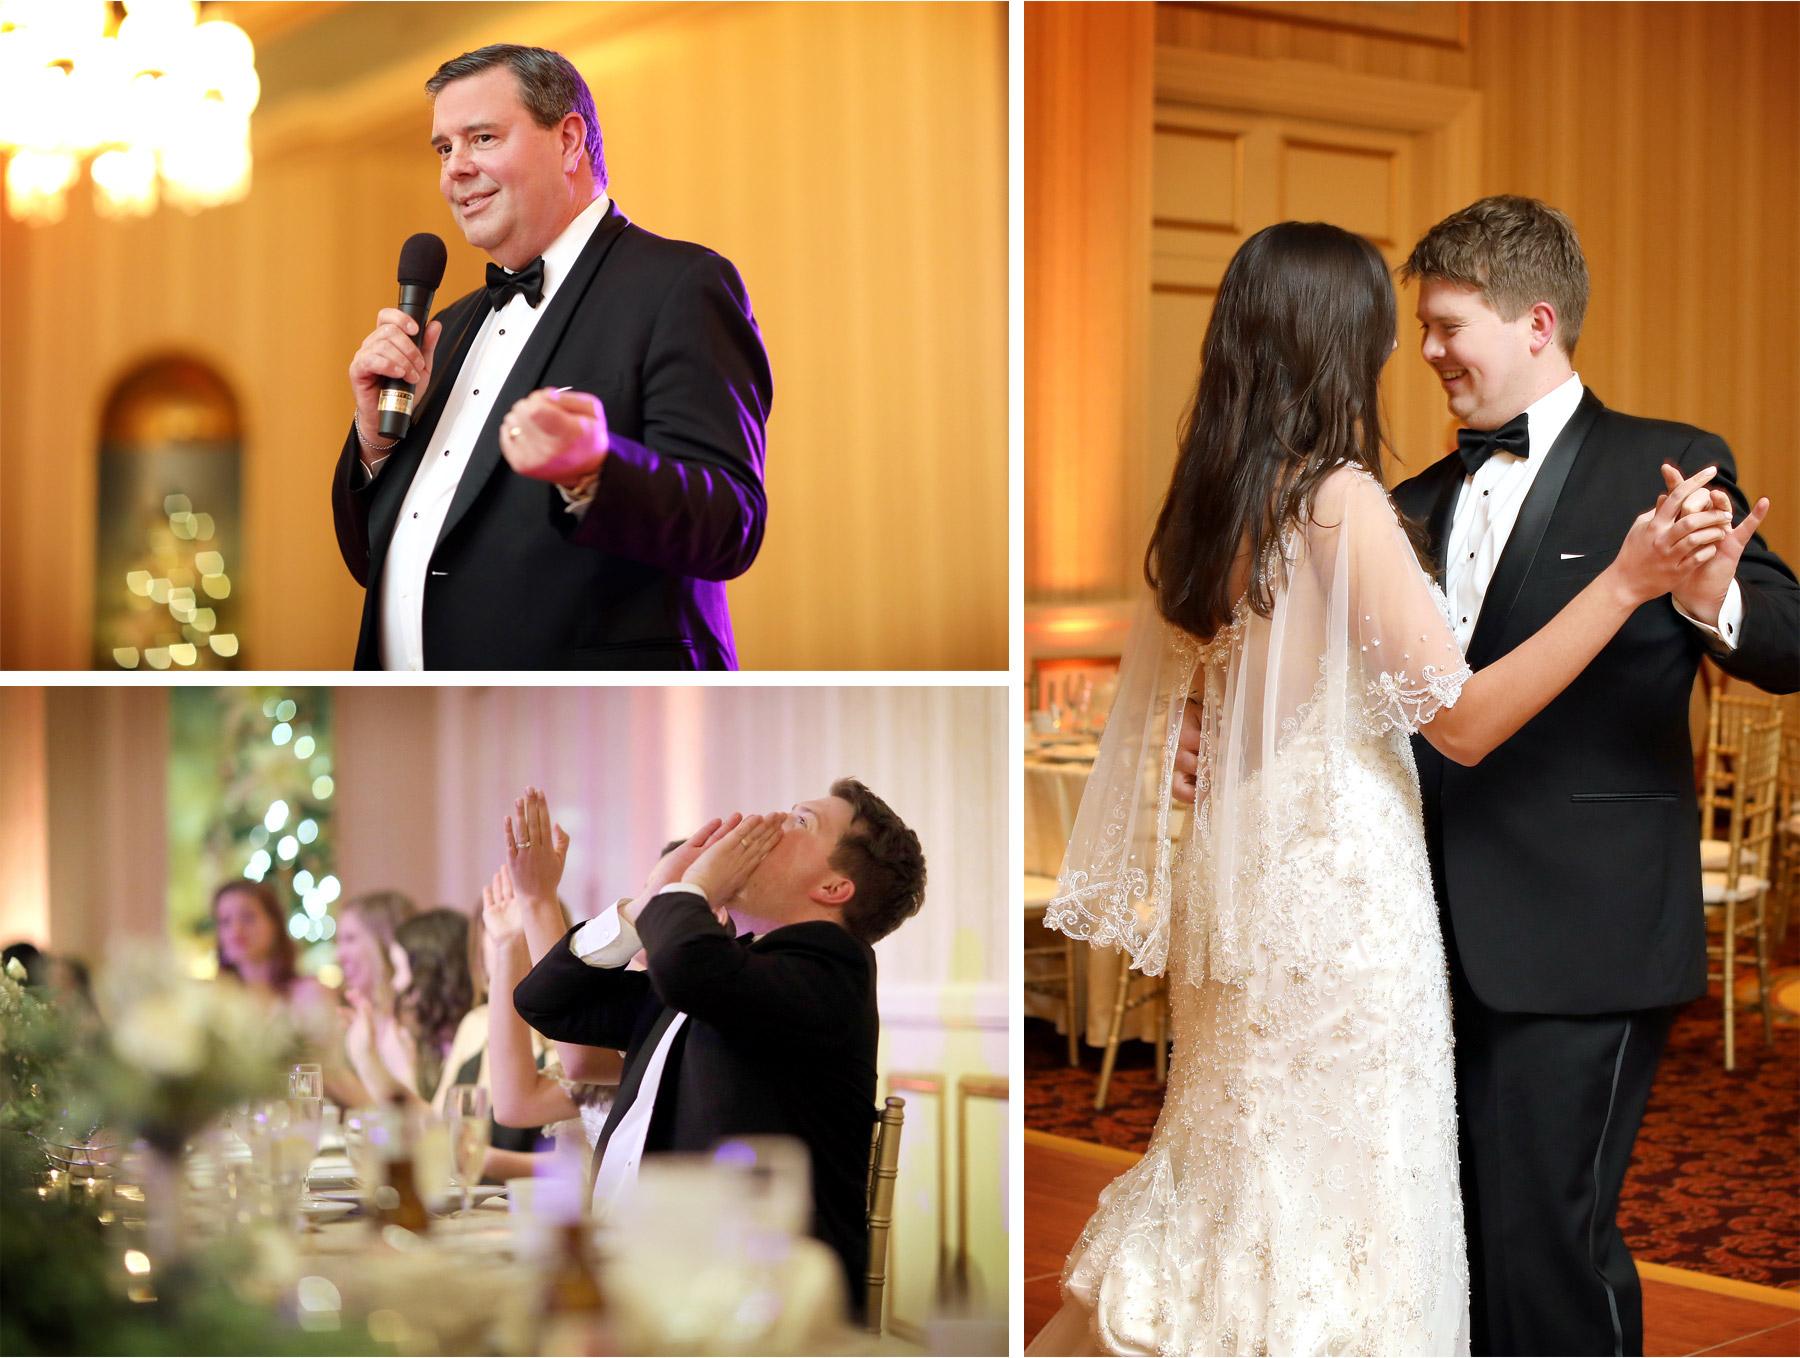 23-Saint-Paul-Minnesota-Wedding-Photography-by-Vick-Photography-Saint-Paul-Hotel-Reception-Toasts-Dance-Sami-and-Nick.jpg